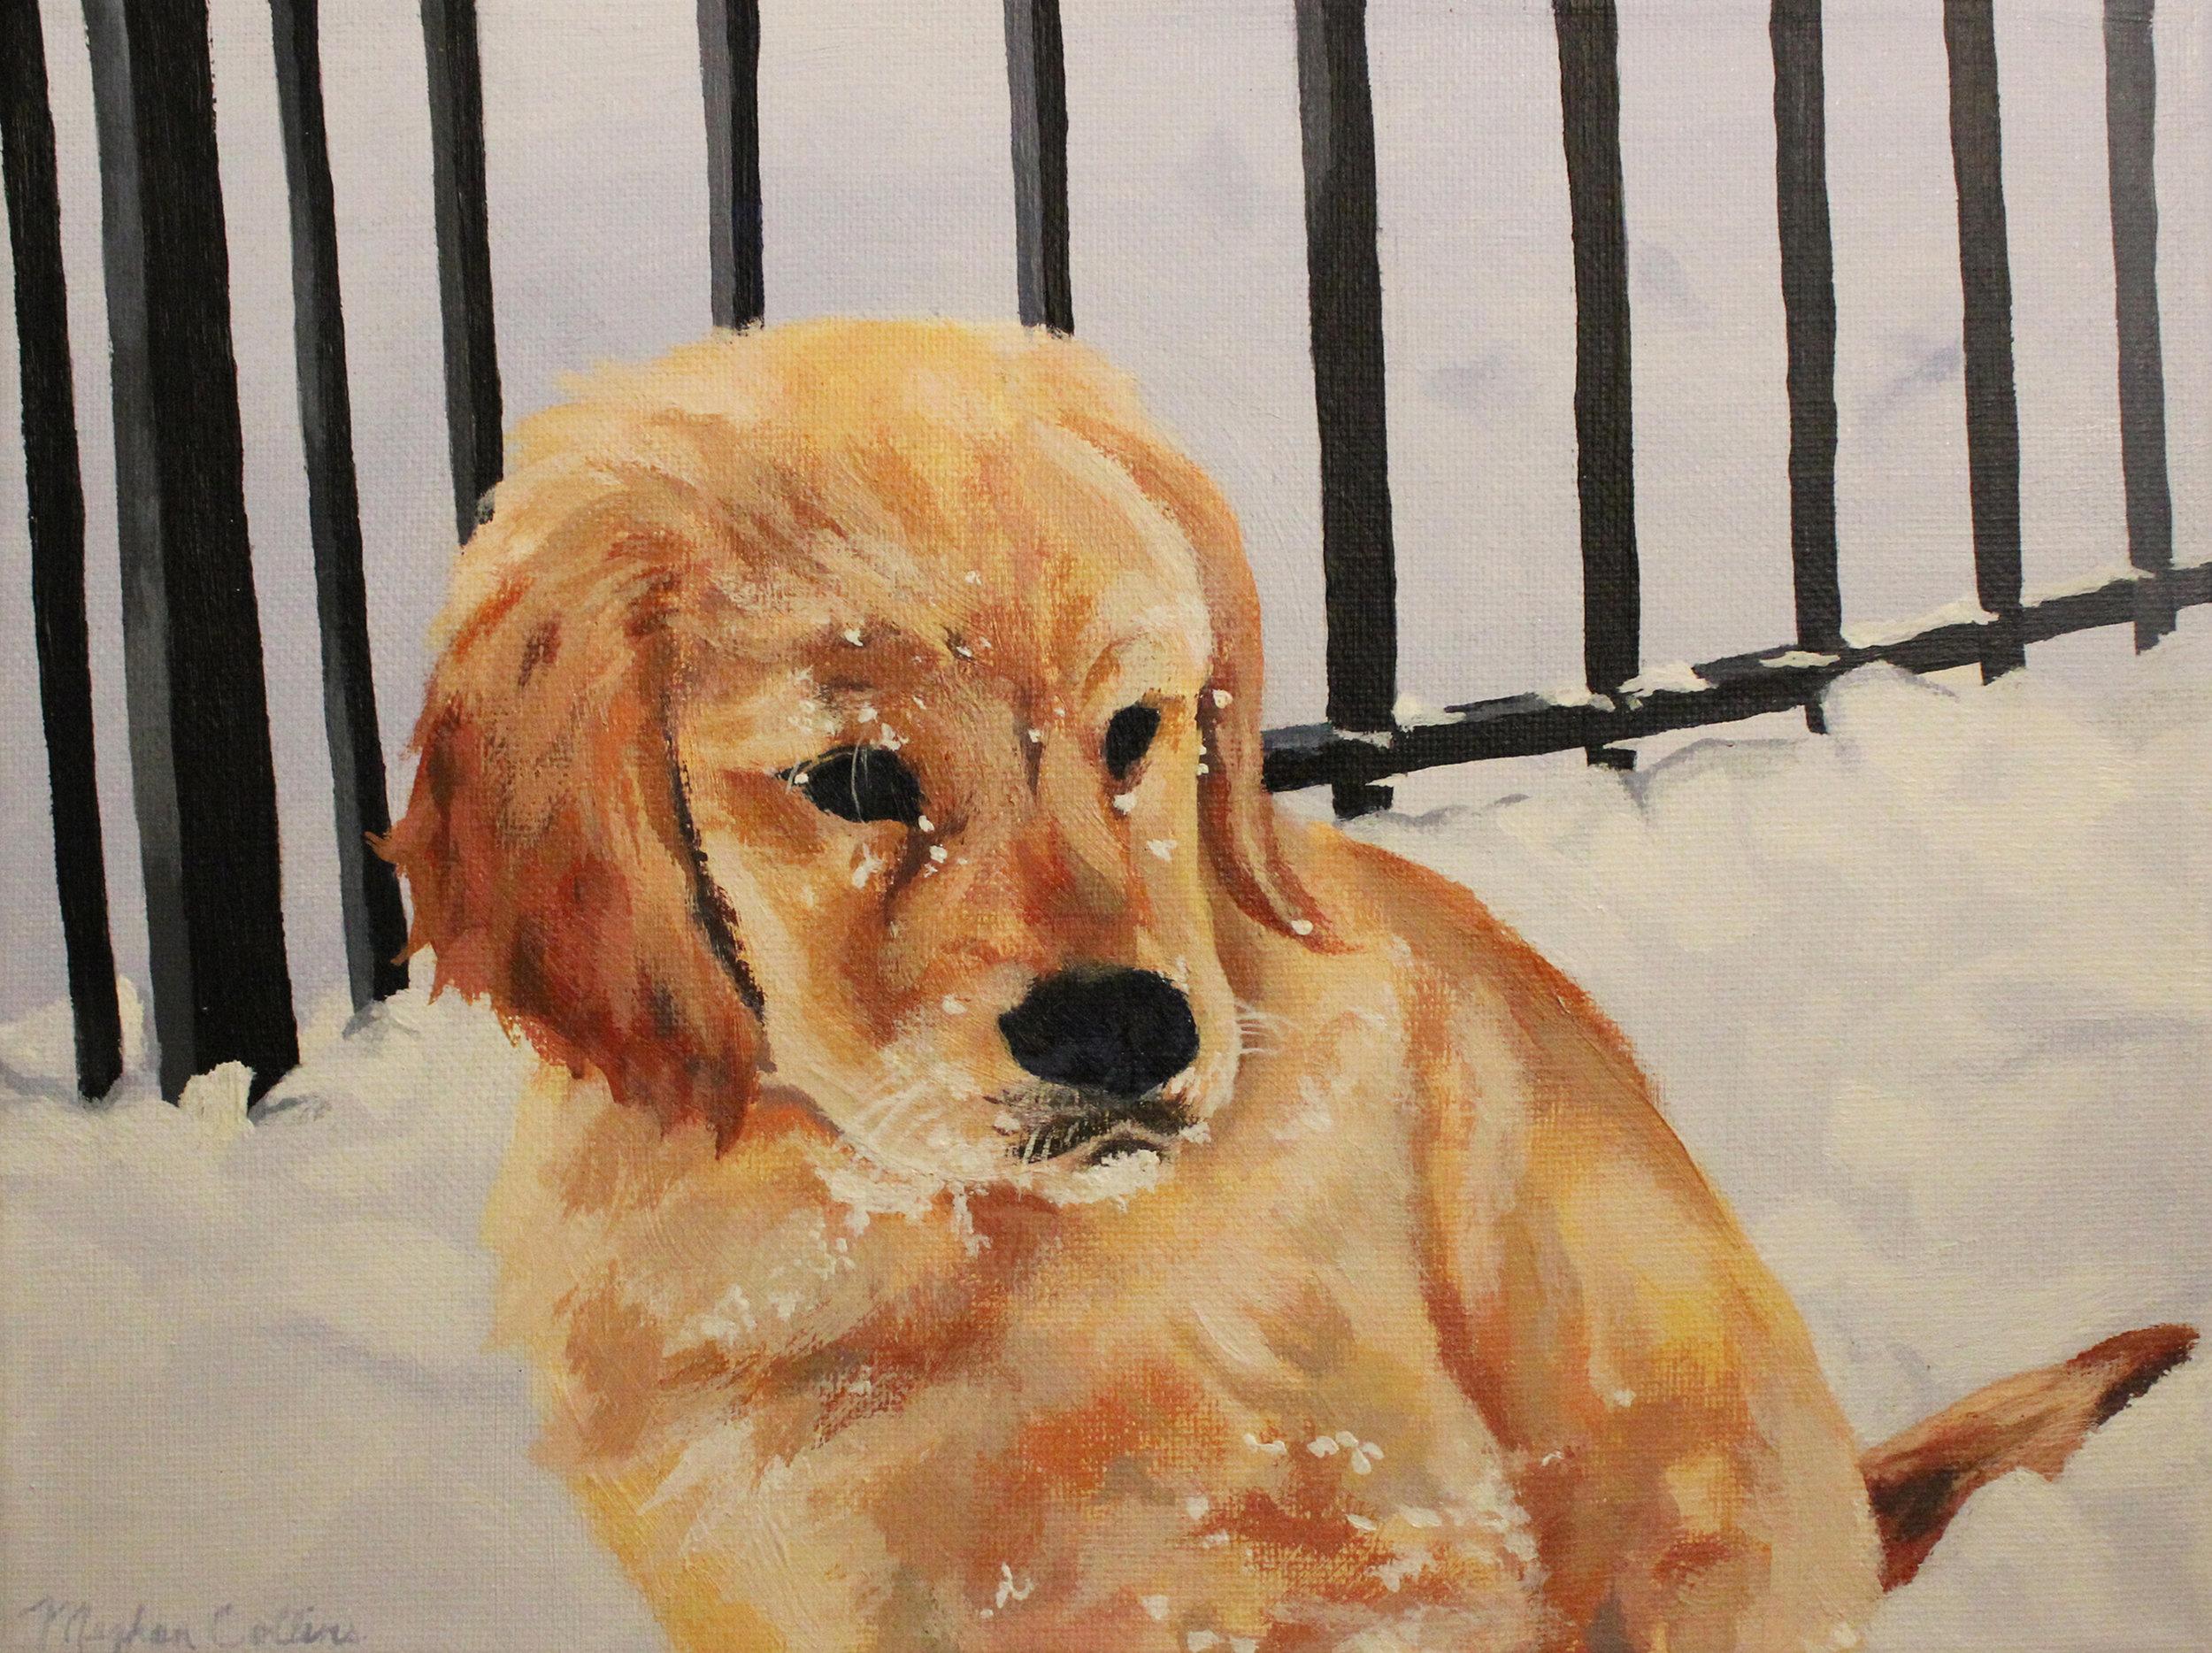 Megcutspaper_Painting_ Golden_Retriever_Puppy_In_Snow.jpg